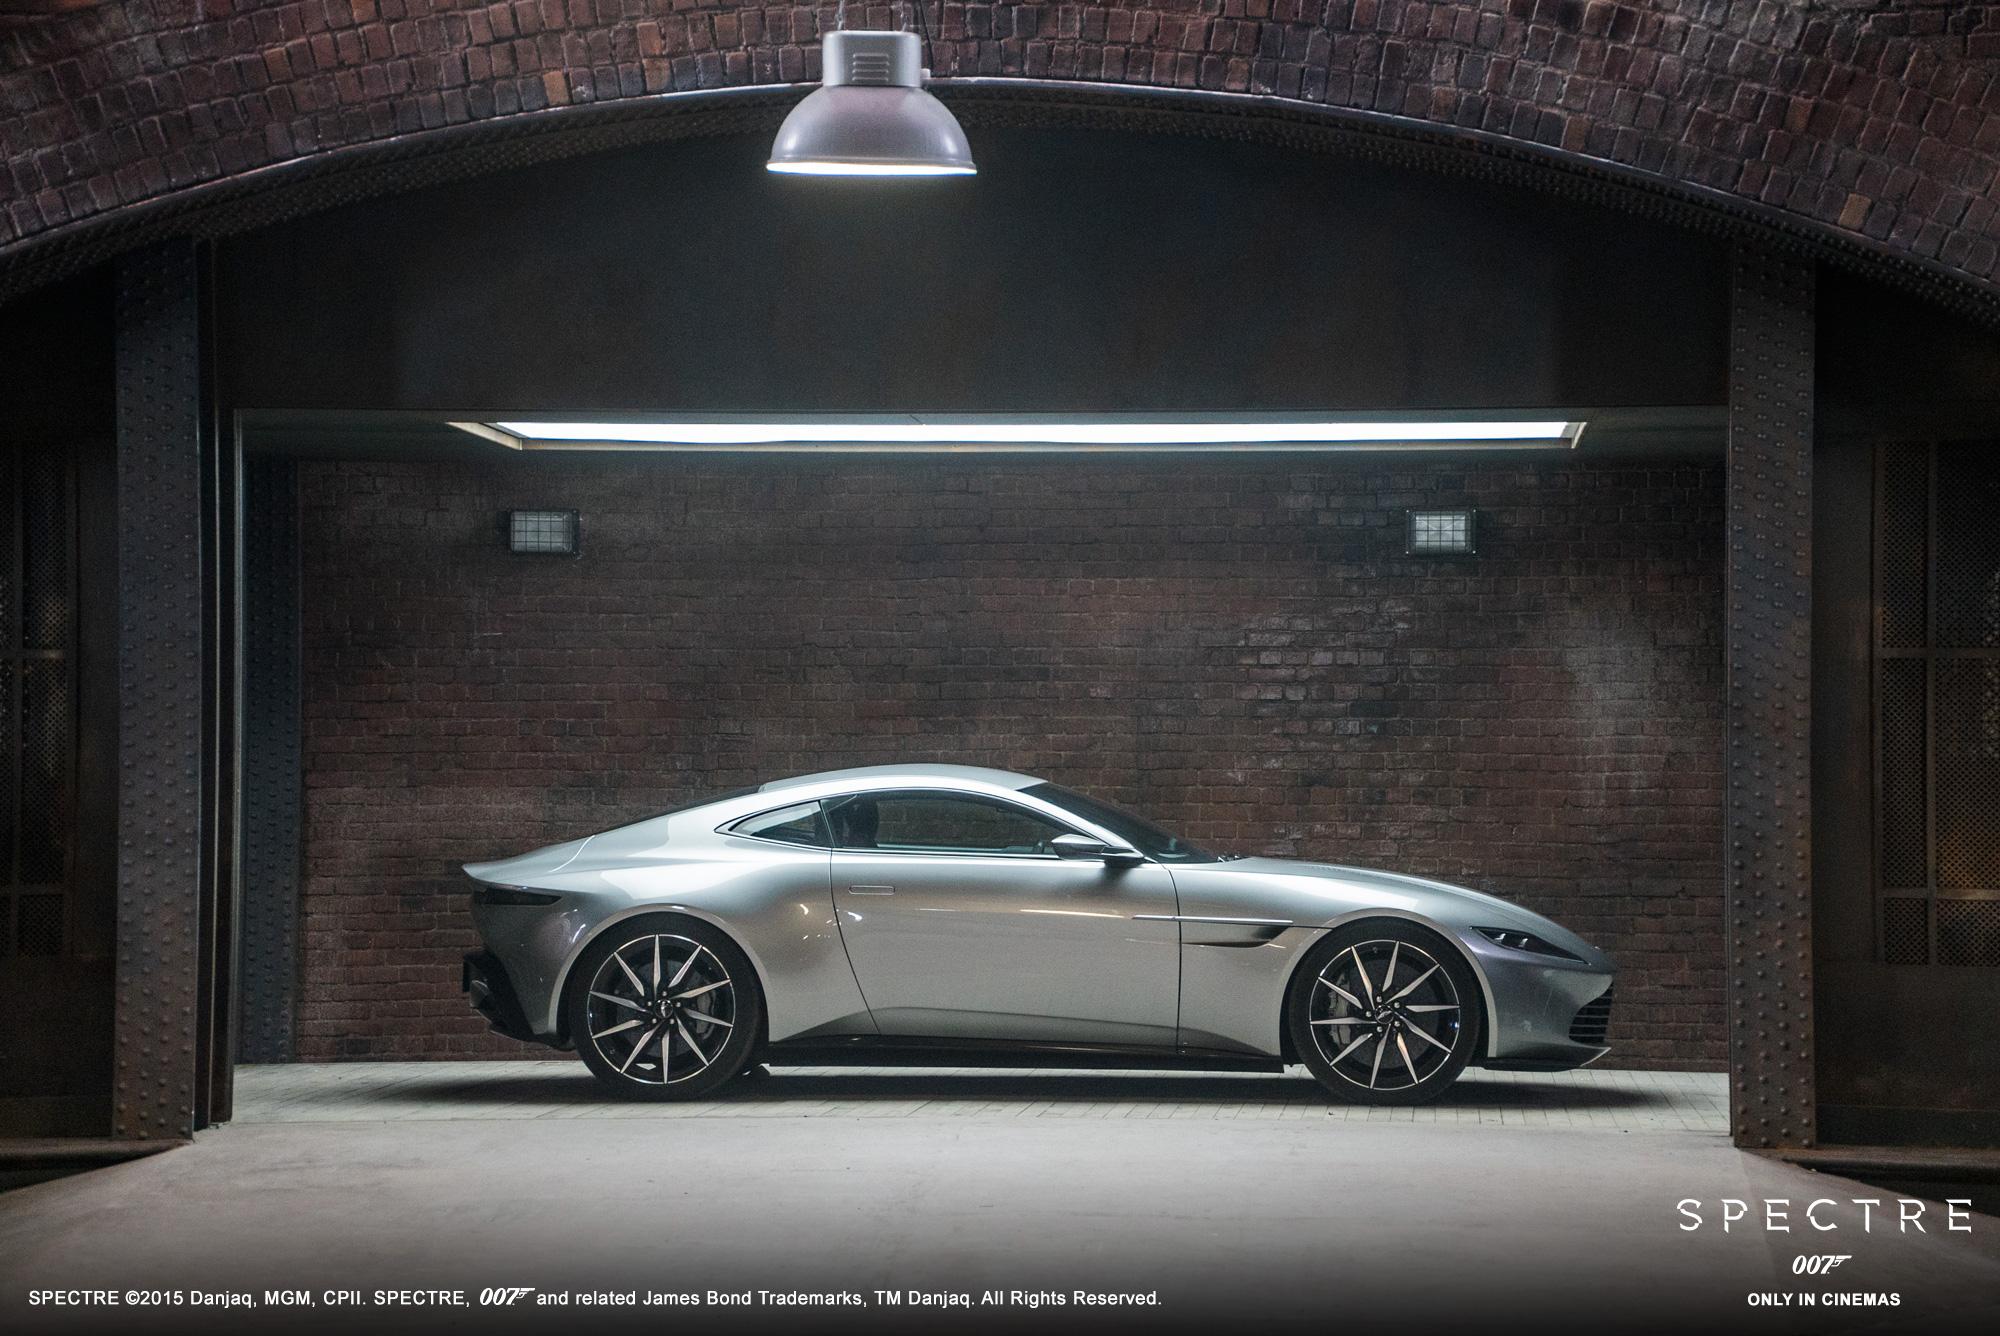 De Aston Martin DB10 in de nieuwste Bondfilm 'Spectre'. Foto: Aston Martin